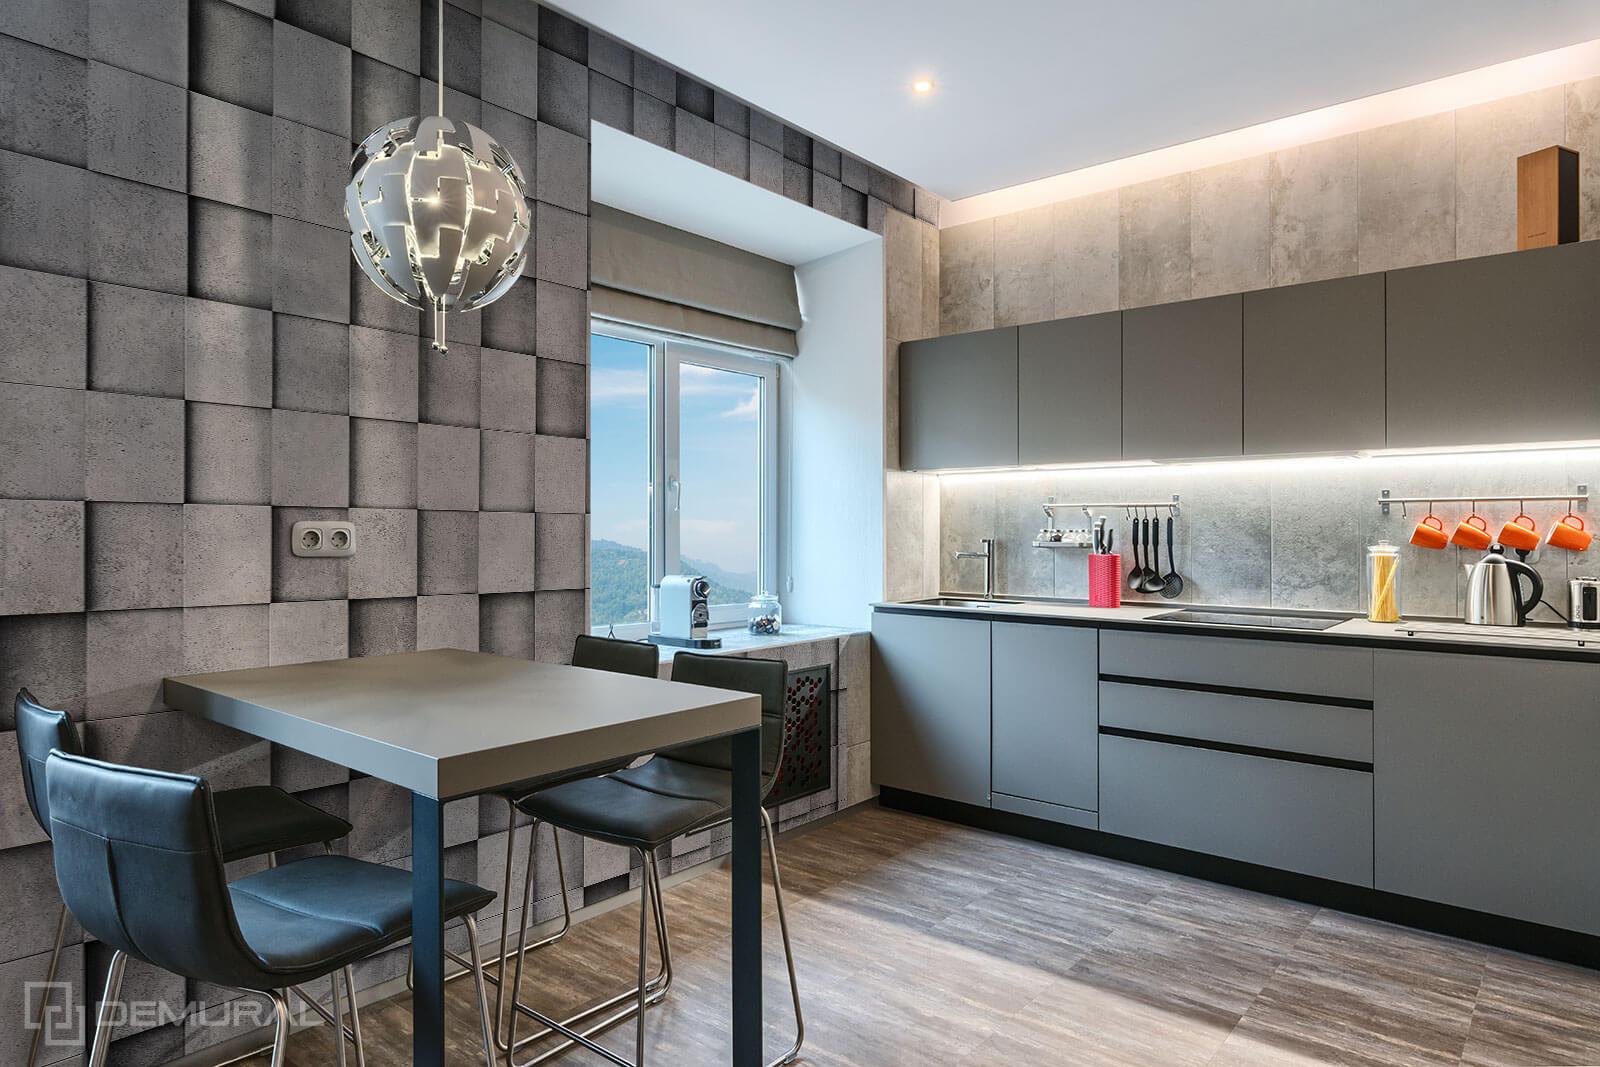 Photo wallpaper Concrete cubes - Photo wallpaper in big kitchen - Demural